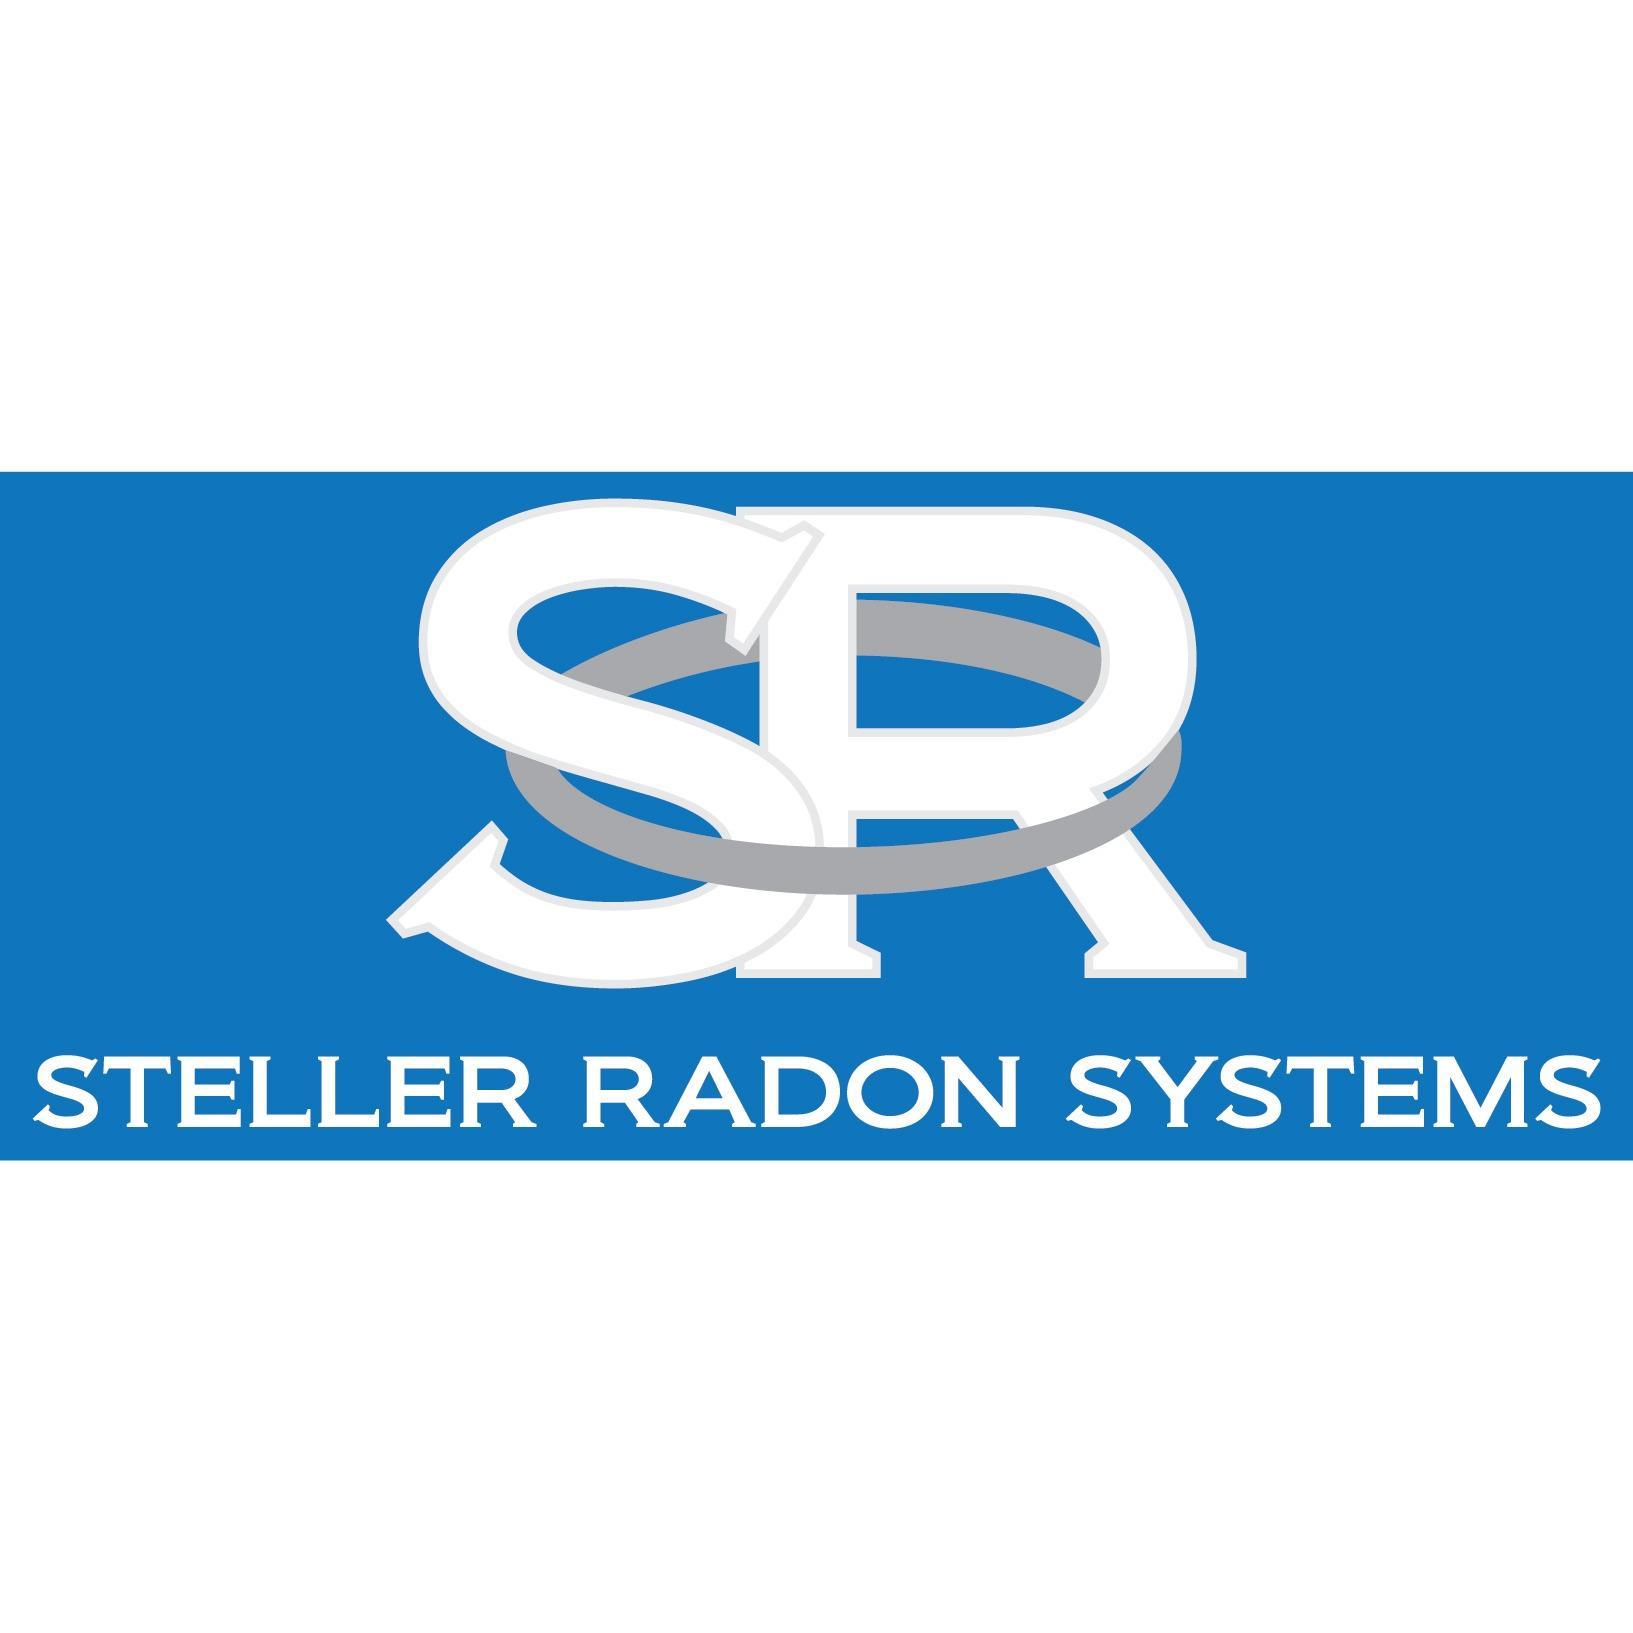 Steller Radon Systems